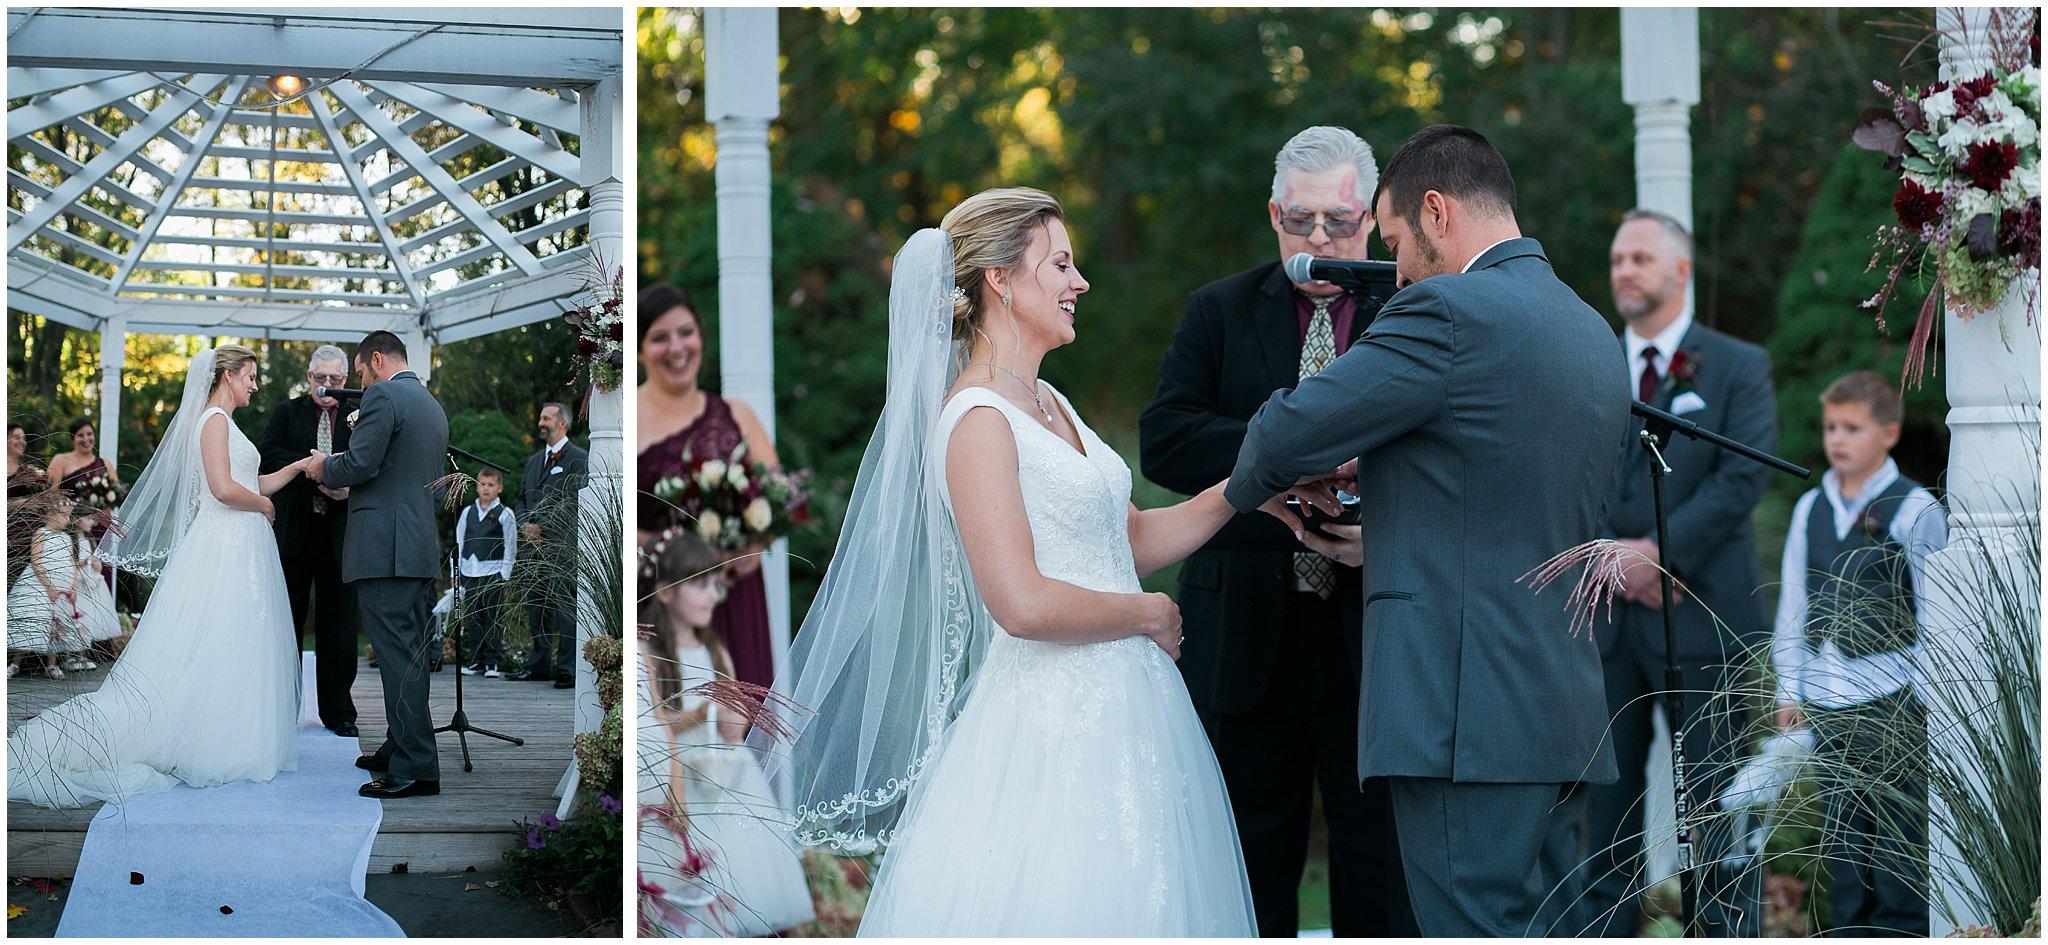 New Windsor New York Hudson Valley New York Wedding Photographer 46.jpg